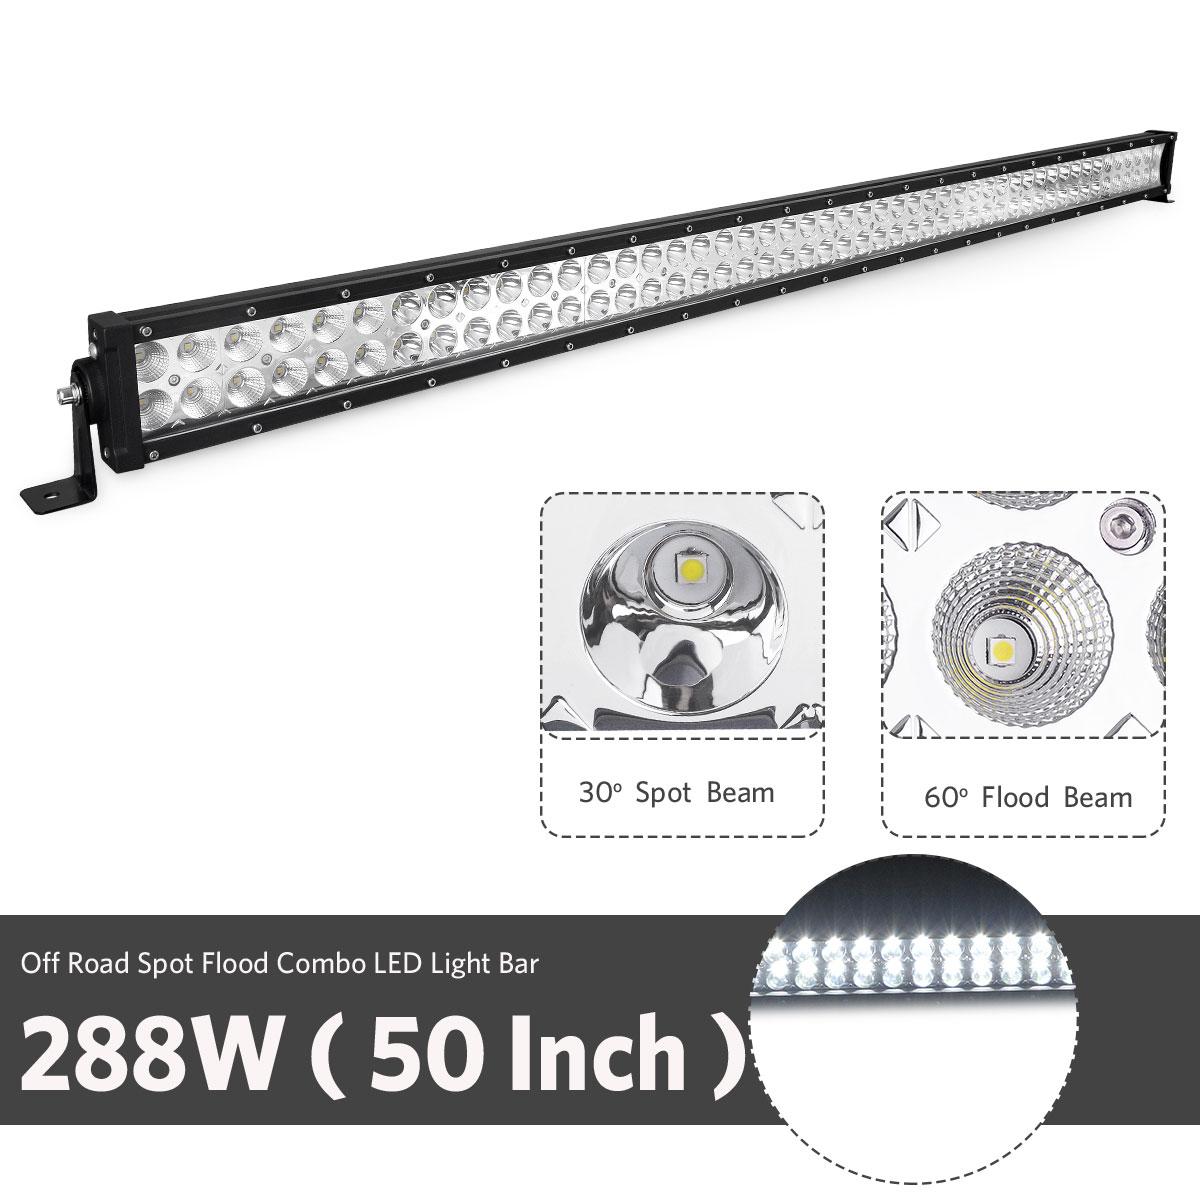 4d Lens 50inch 288w Led Light Bar Combo Driving Lamp 4wd